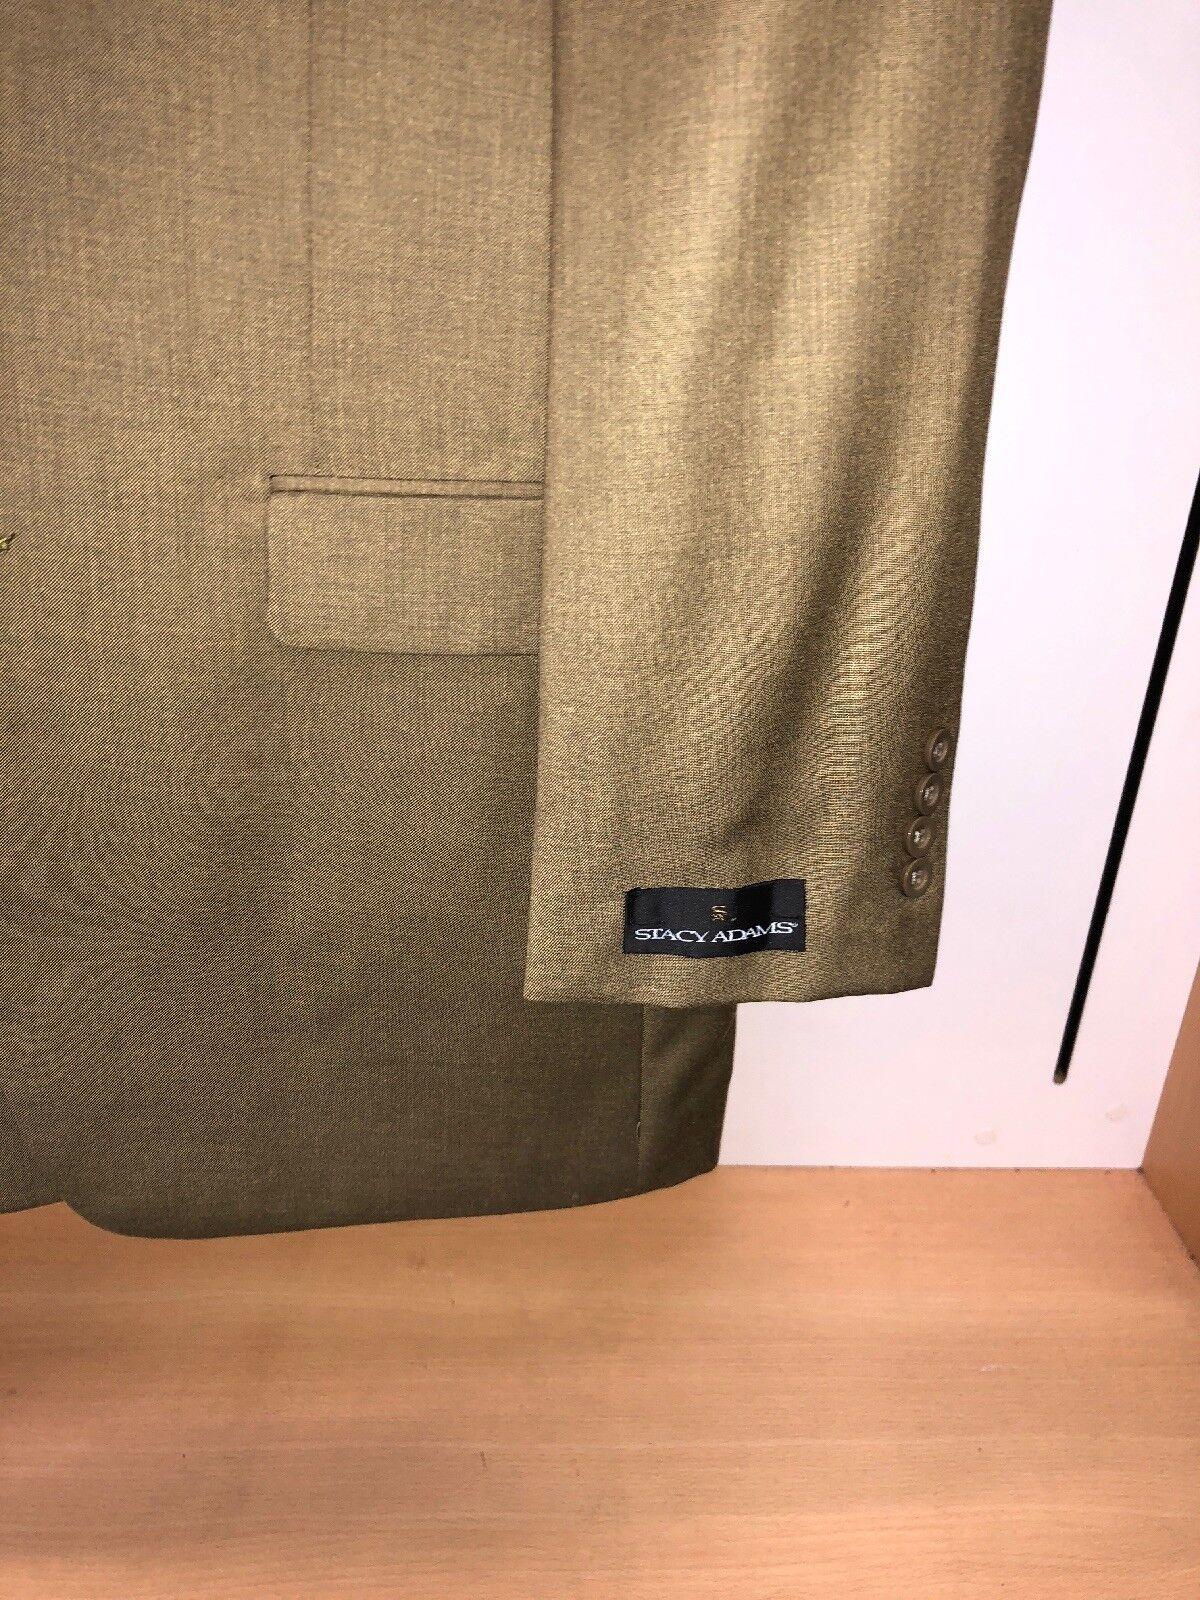 BNWT Stacy Tan ADAMS 38R Tan Stacy Khaki Fashion Solid Harvey Classy Suit 2PC Steve WOW ef8a49